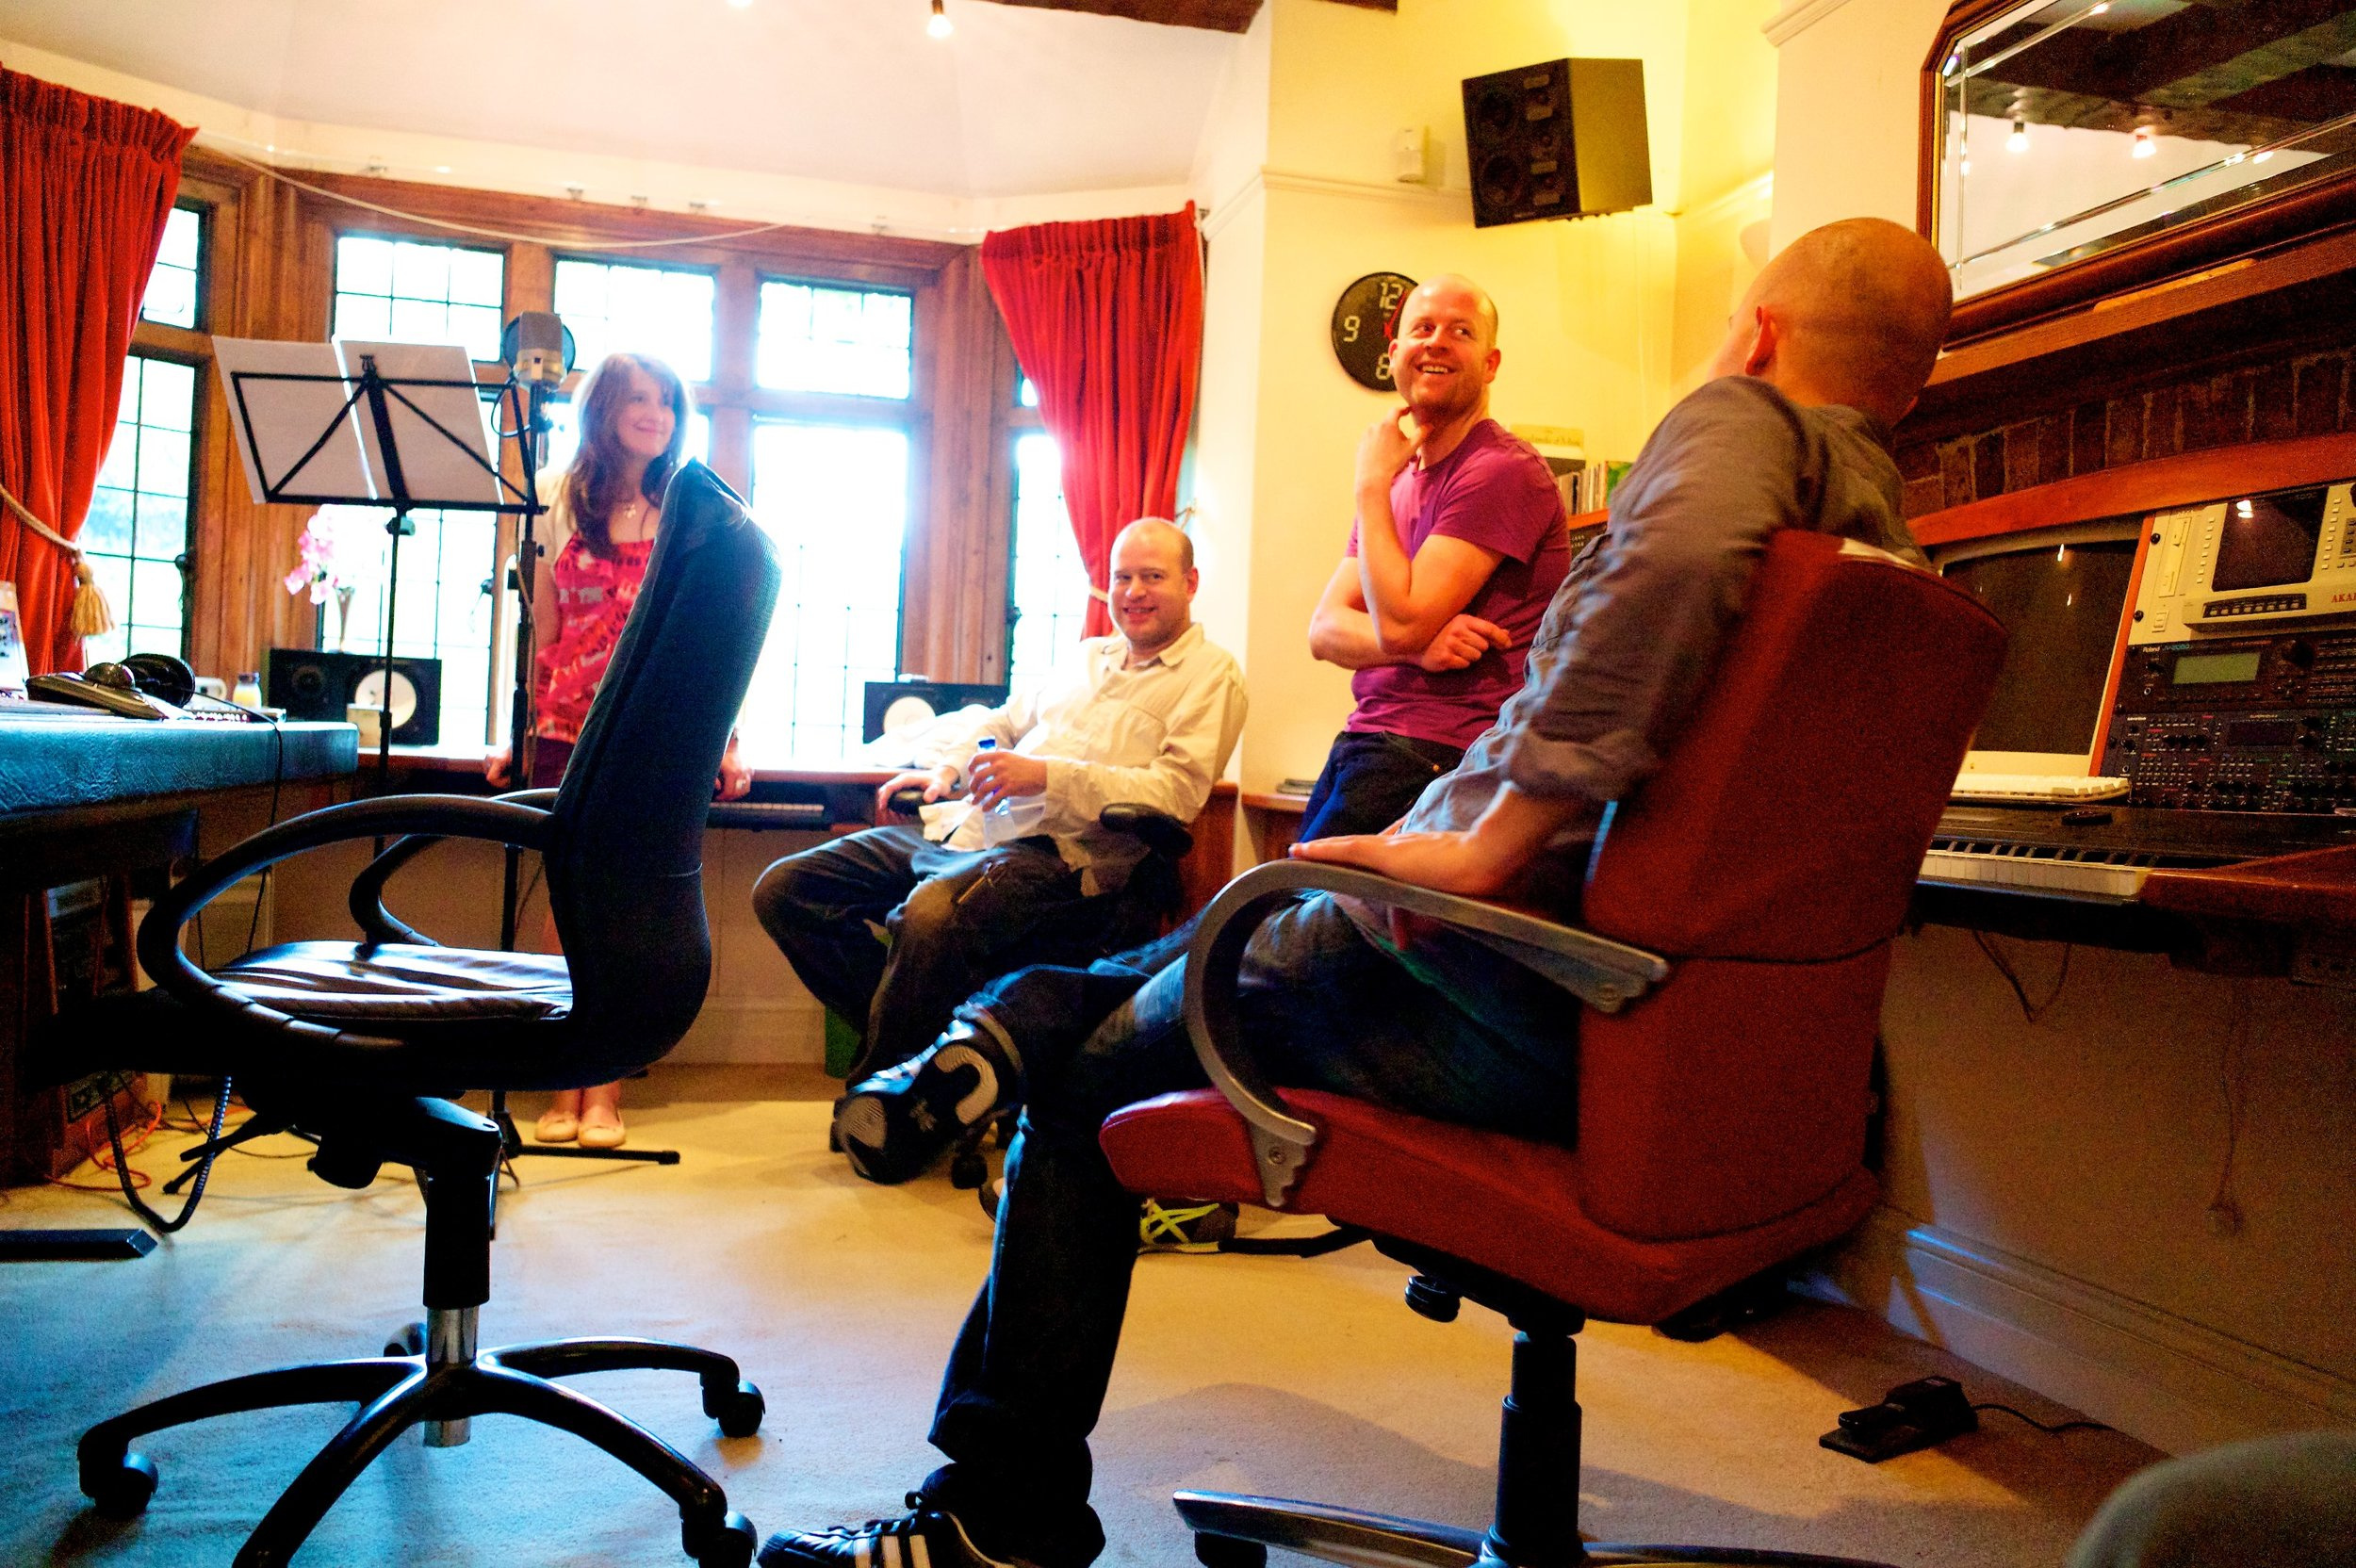 All smiles in Curt's studio 19:6:11.jpg